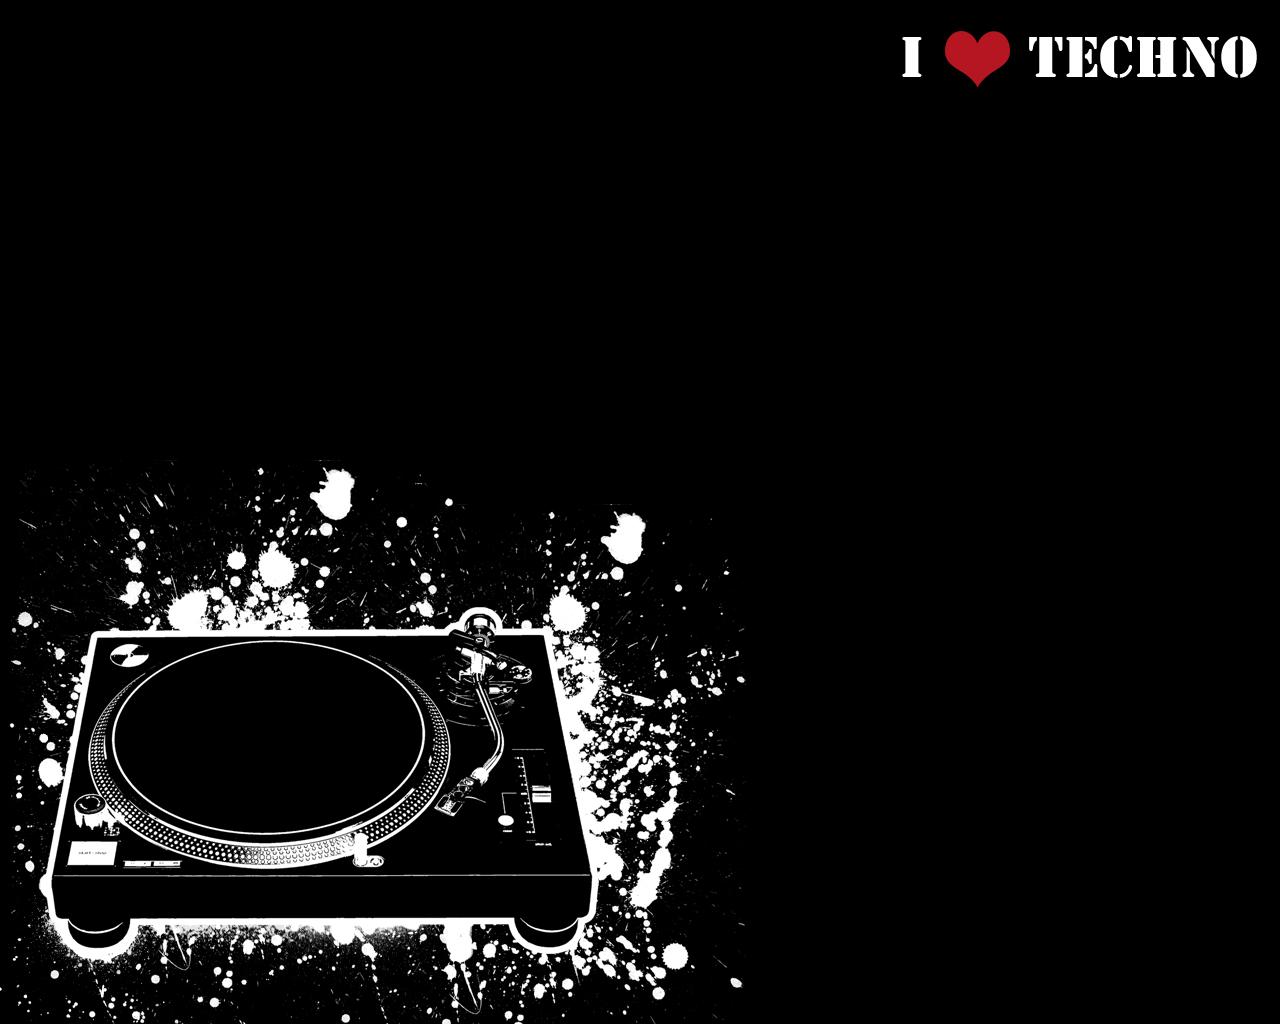 I love Techno by mortifi